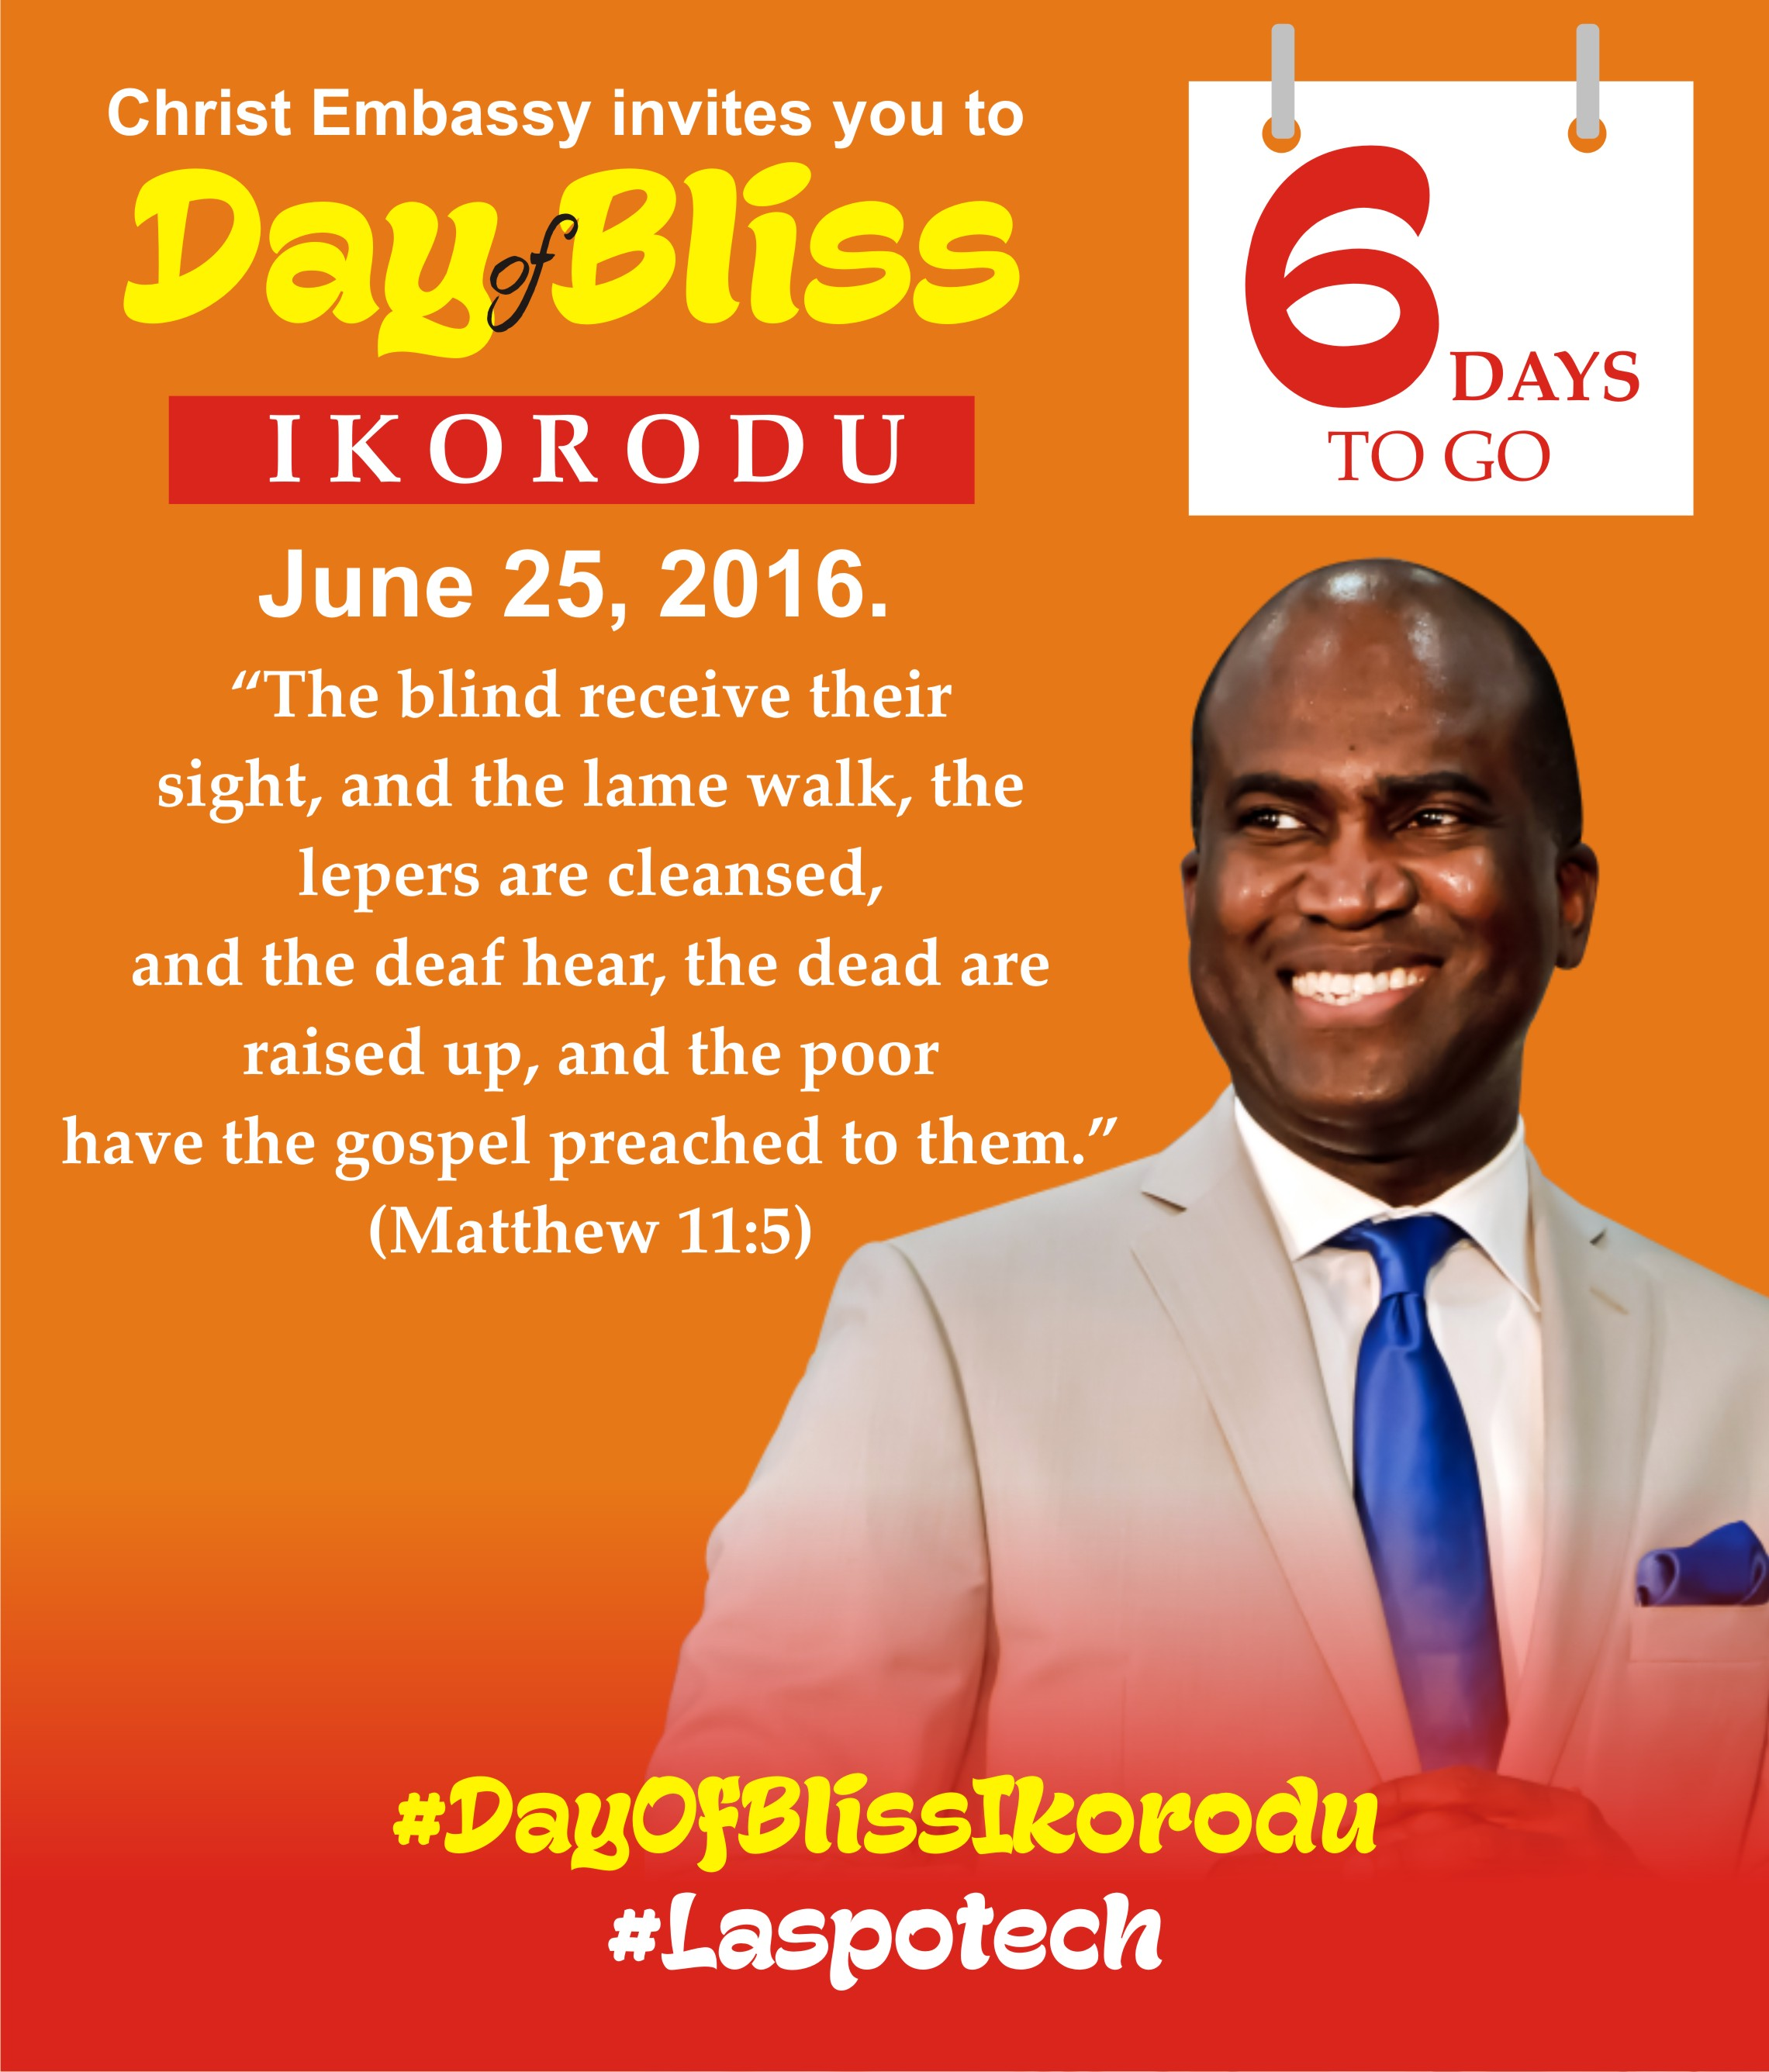 9 Days to go #DayOfBlissIkorodu